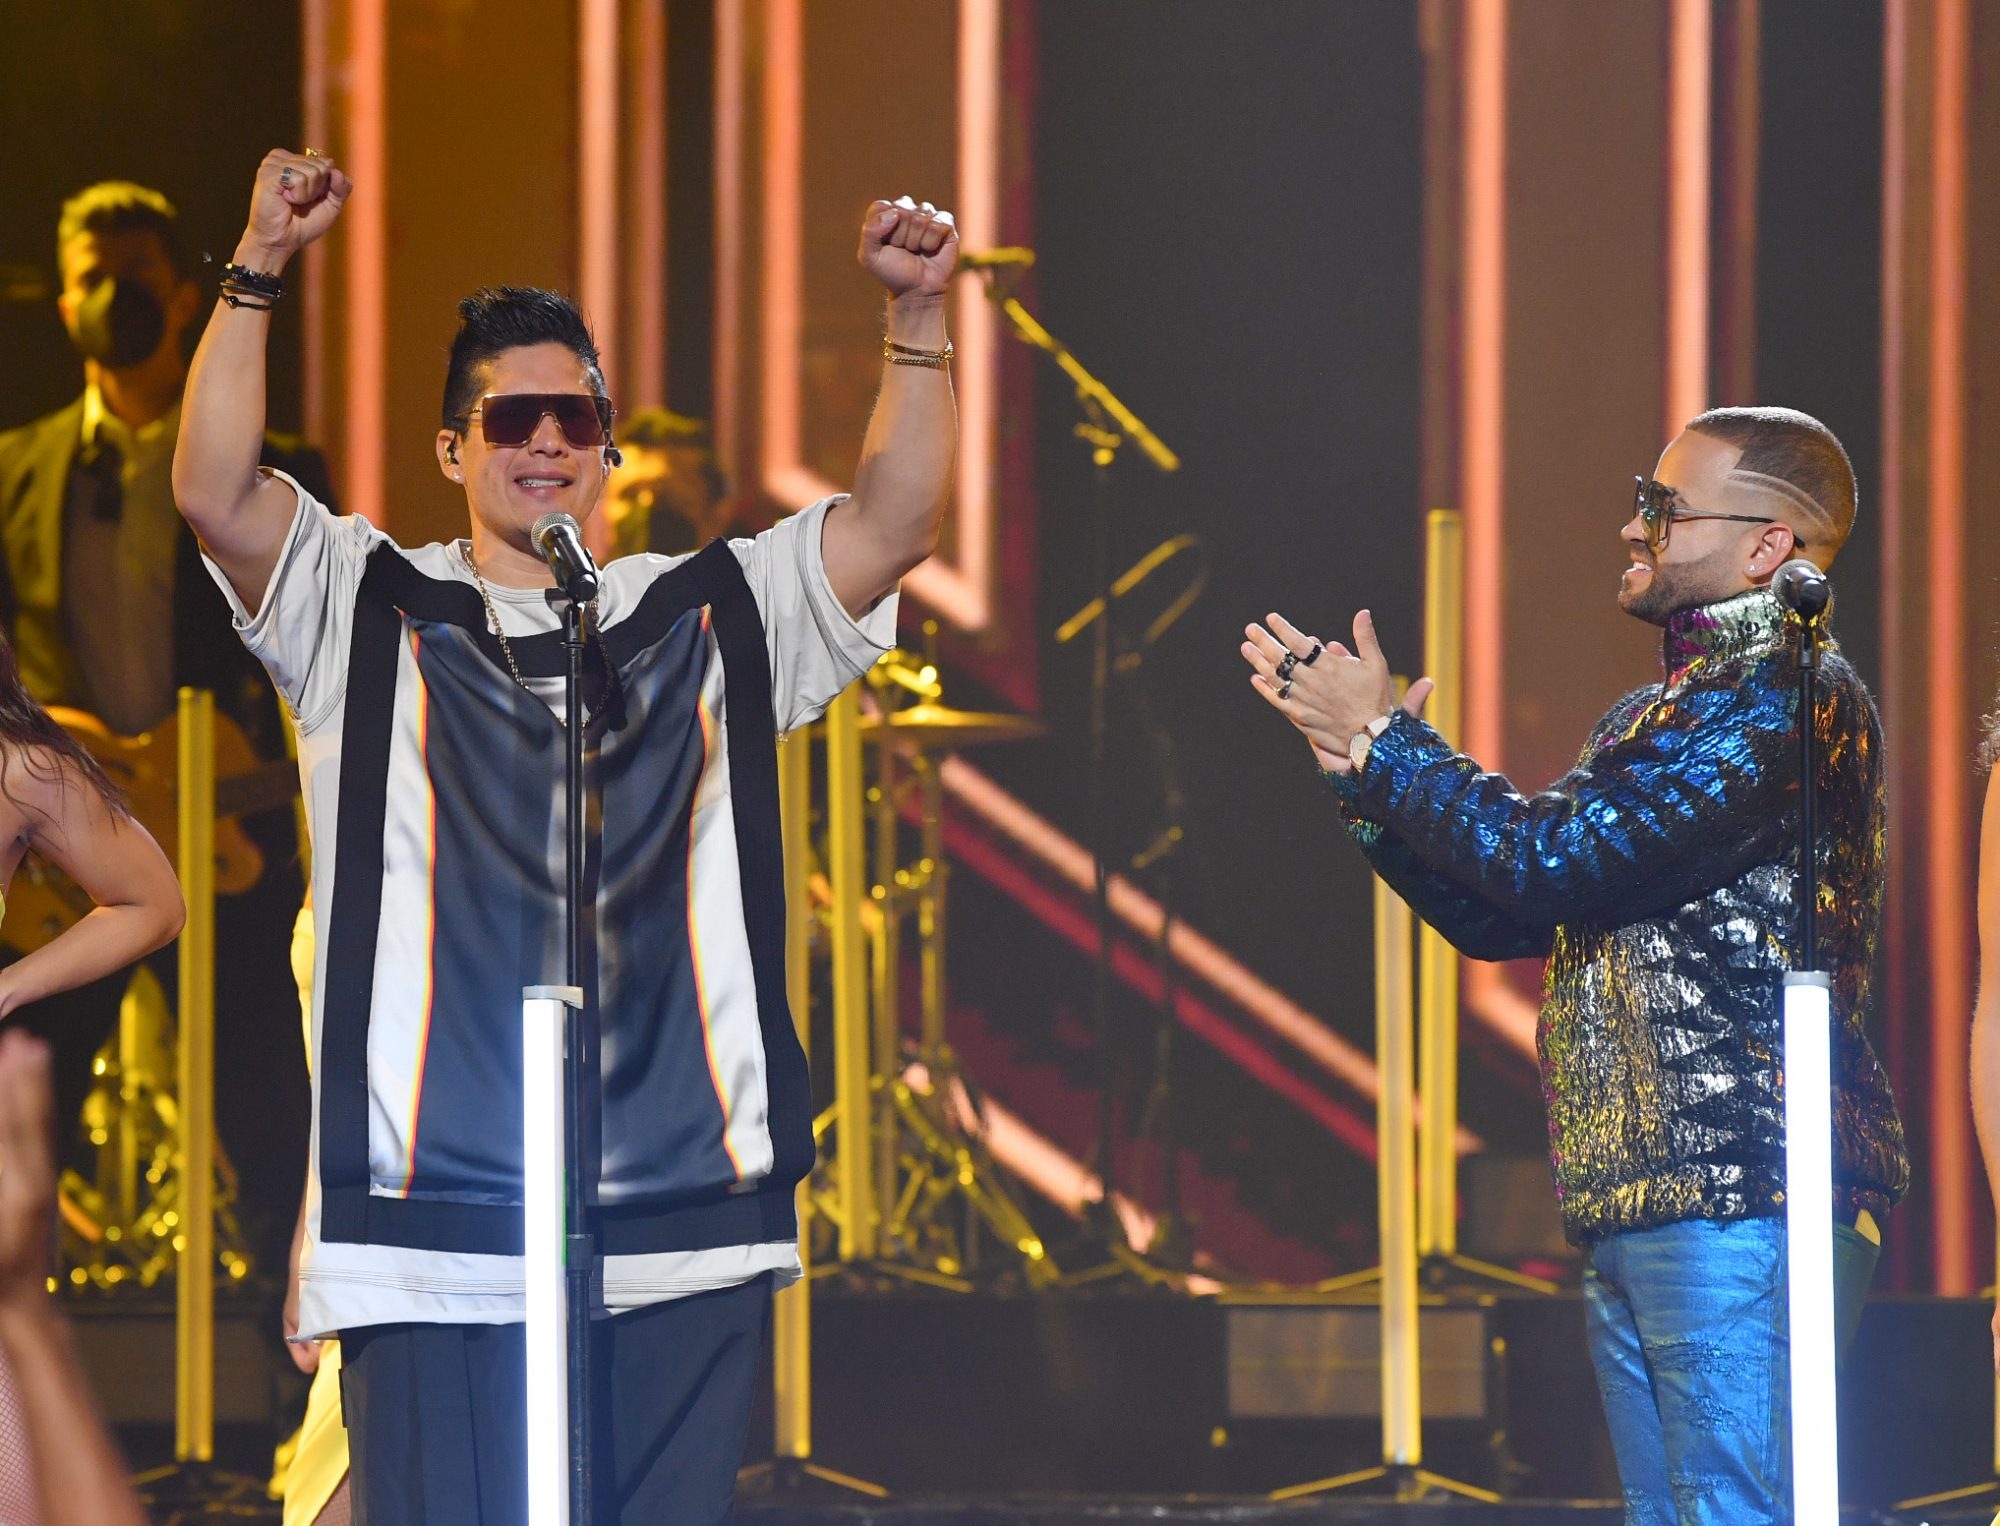 Chino and Nacho perform during Premios Juventud 2021